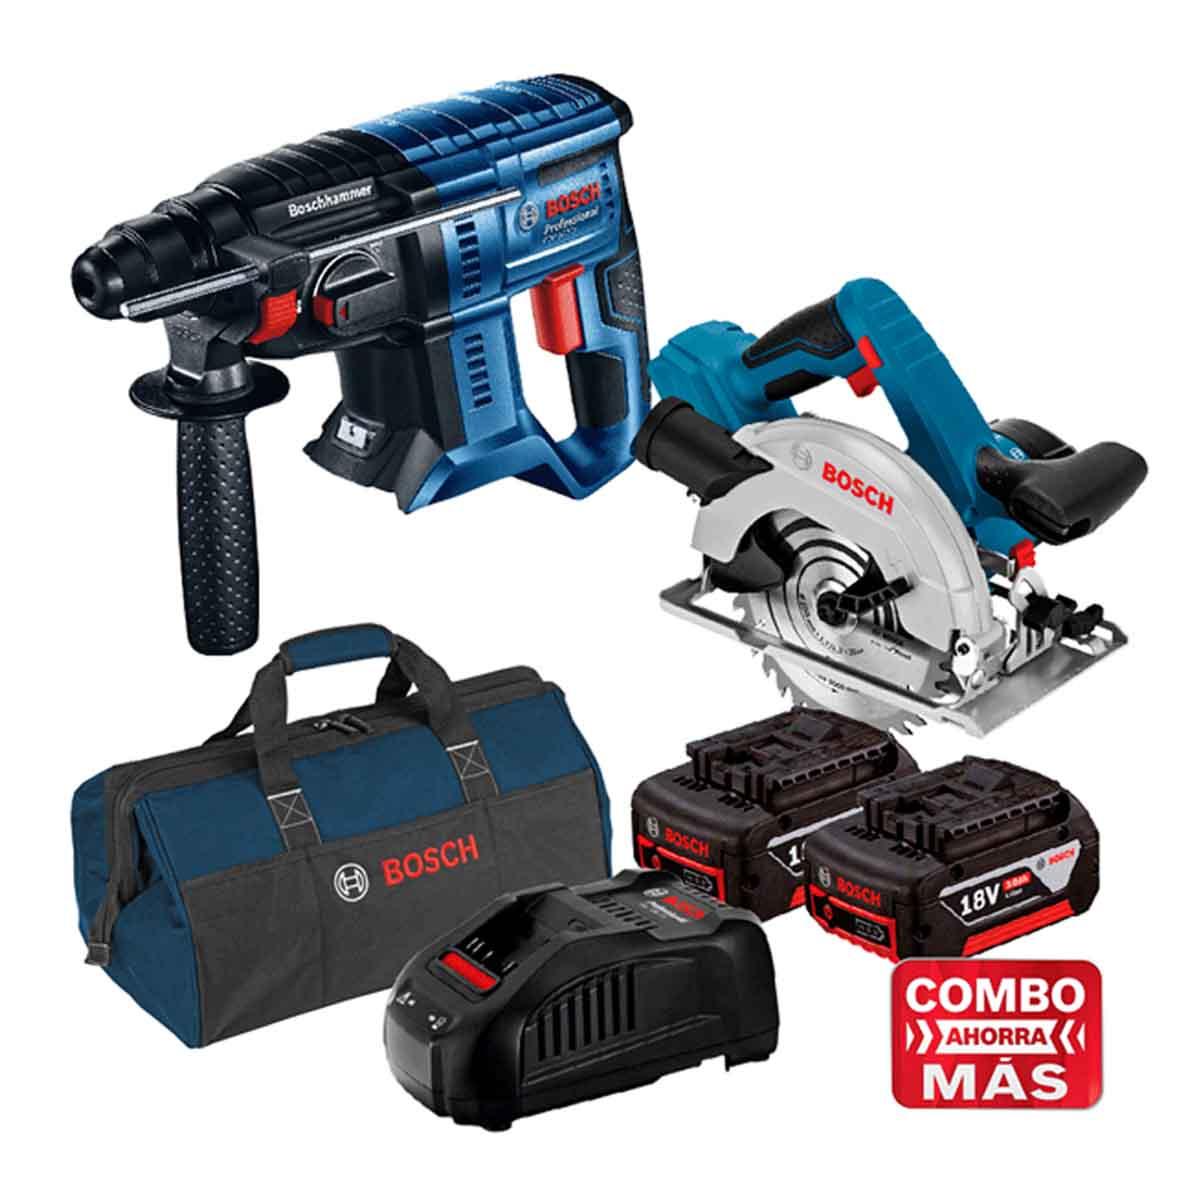 Sierra + Taladro 18V + 2 Baterias + Cargador + Maleta Bosch